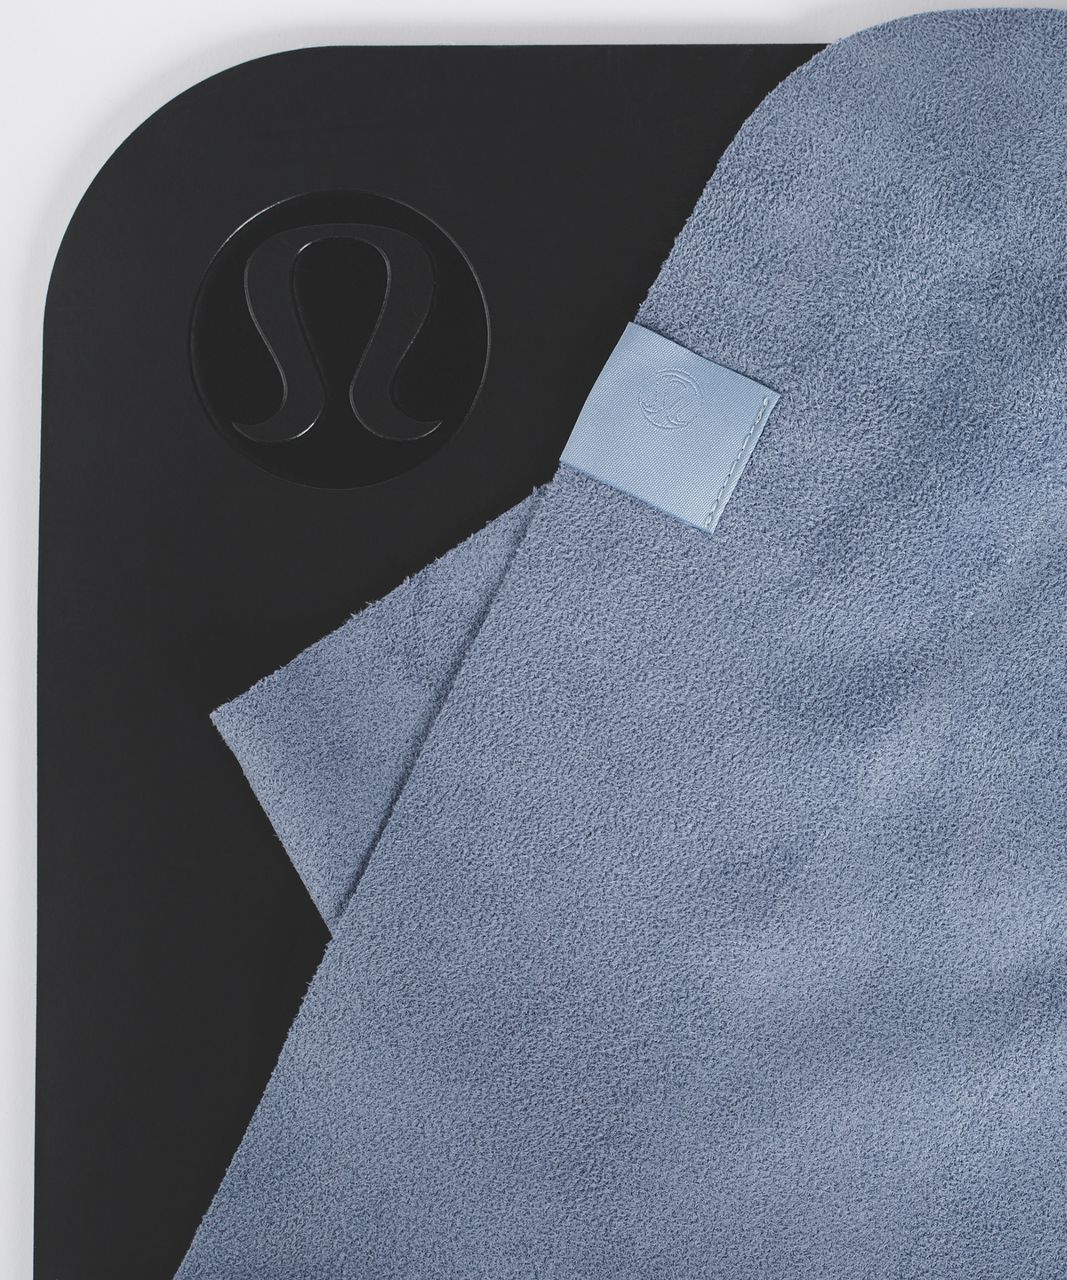 Lululemon The (Small) Towel - Blue Denim